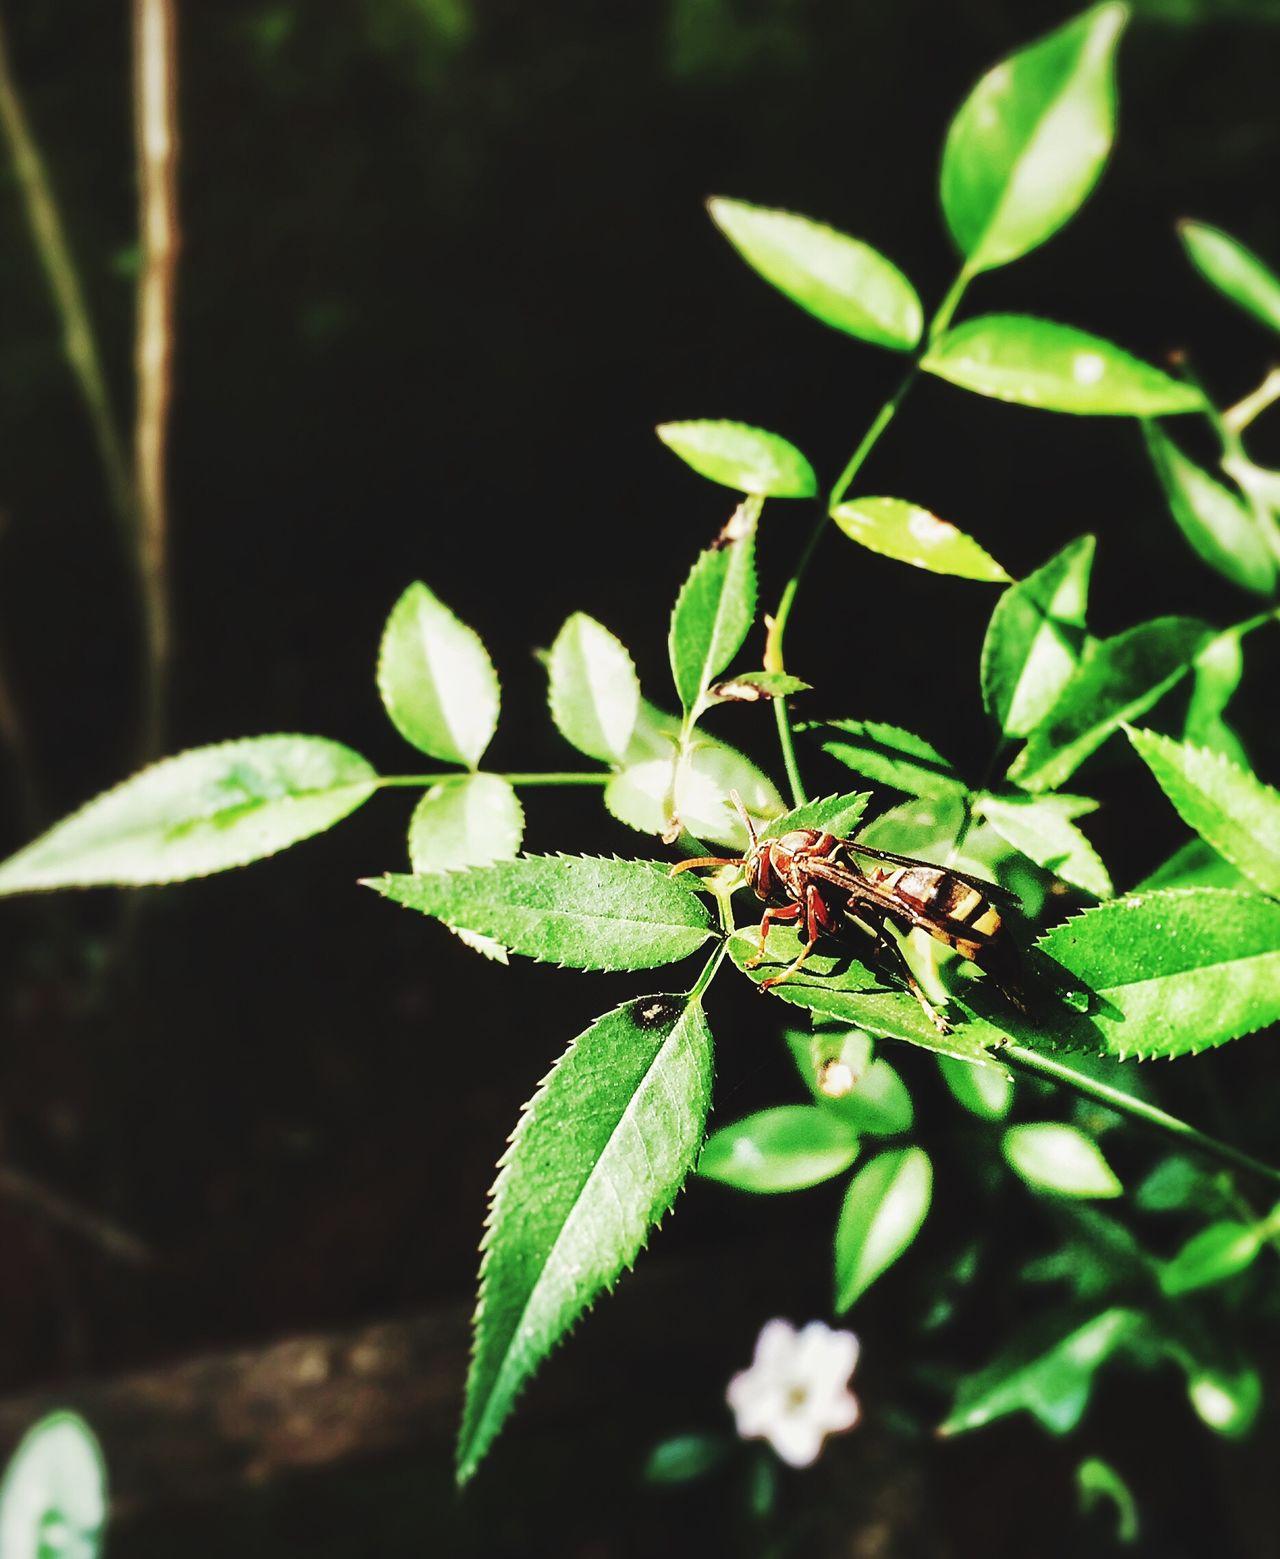 A Click from my garden. Naturelover BashPhotography